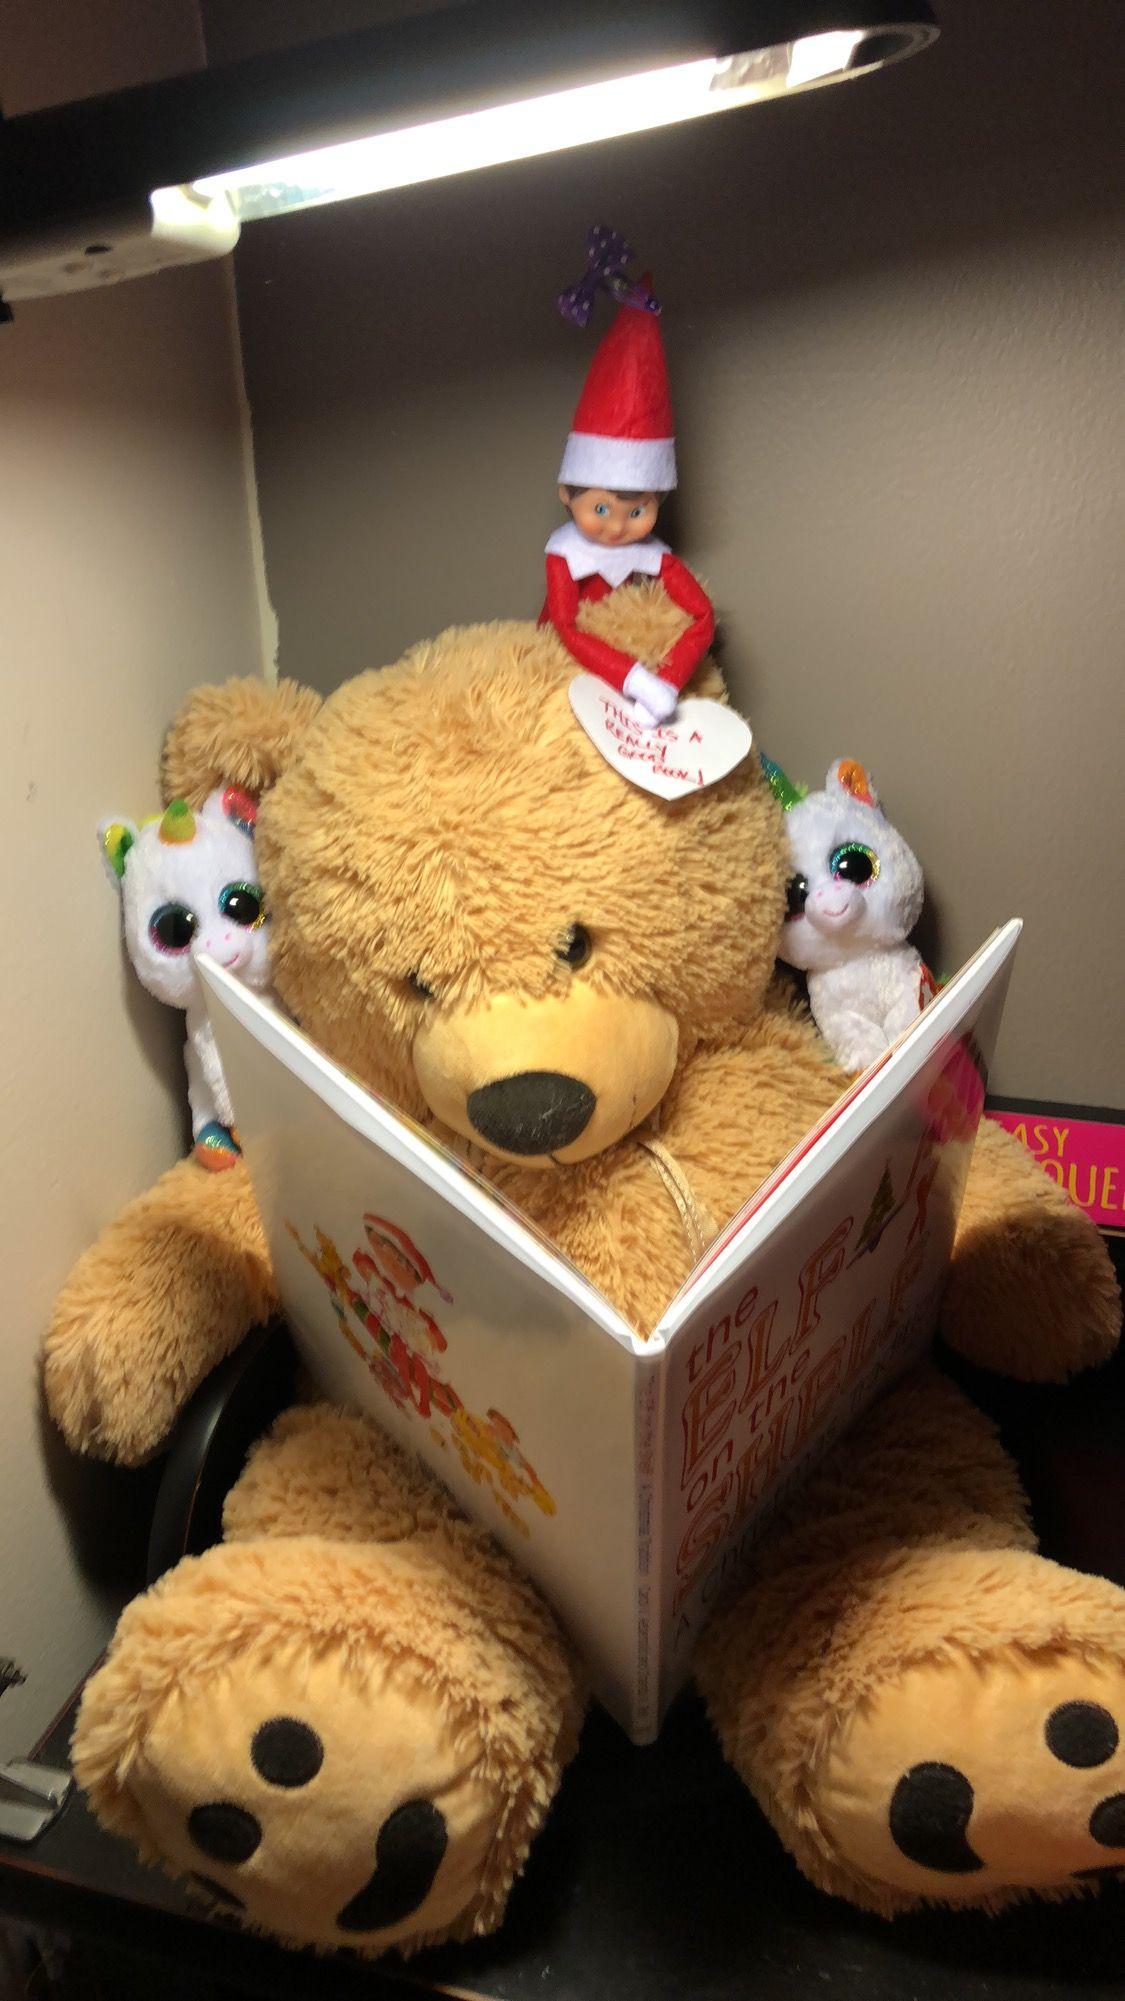 Elfontheshelf Elfontheshelfideas Elf Teddybear Books